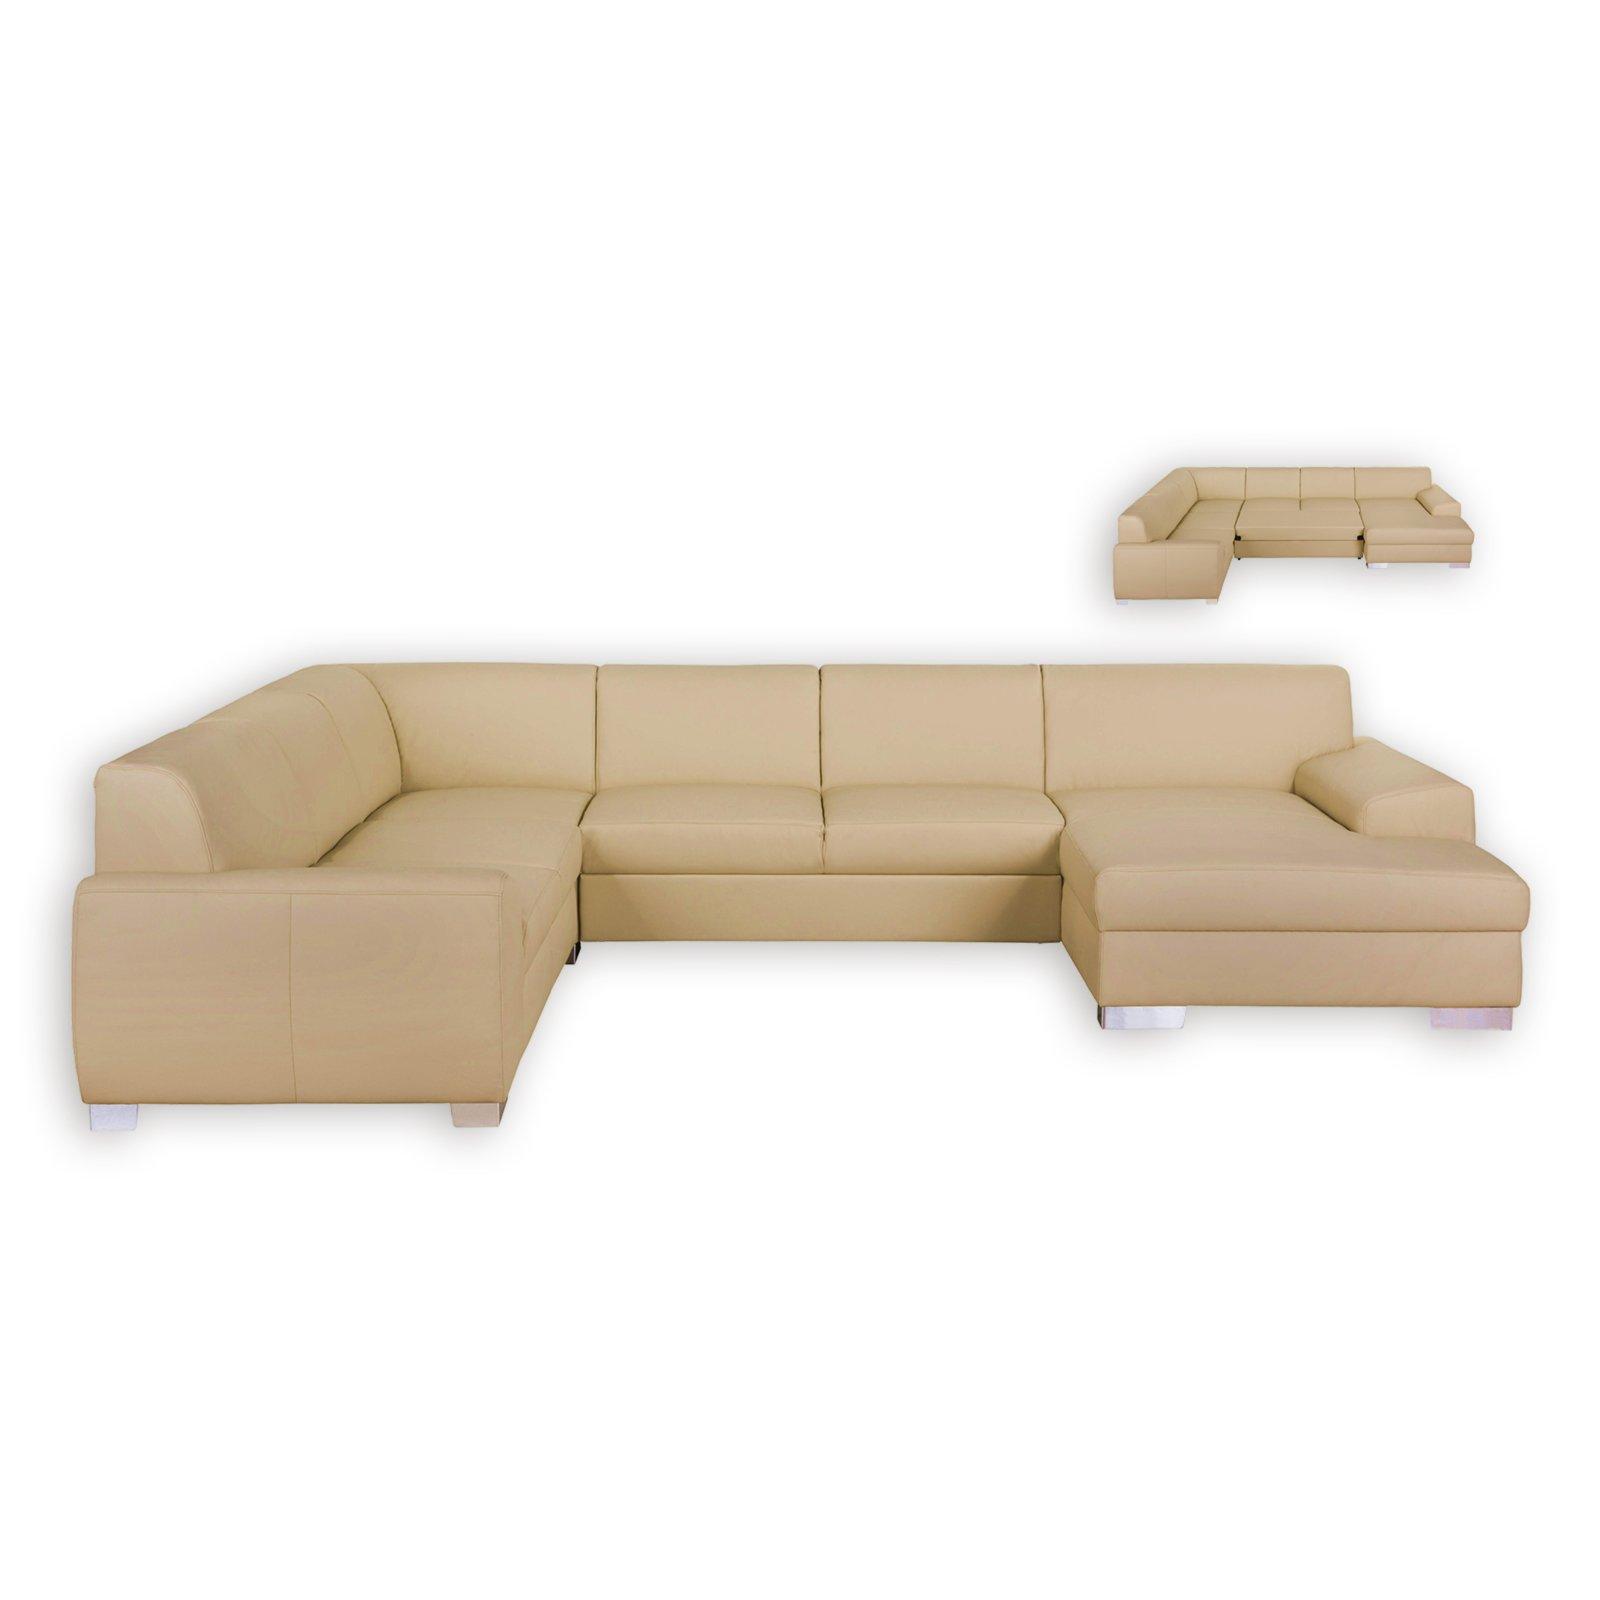 wohnlandschaft beige liegefunktion recamiere rechts wohnlandschaften u form sofas. Black Bedroom Furniture Sets. Home Design Ideas